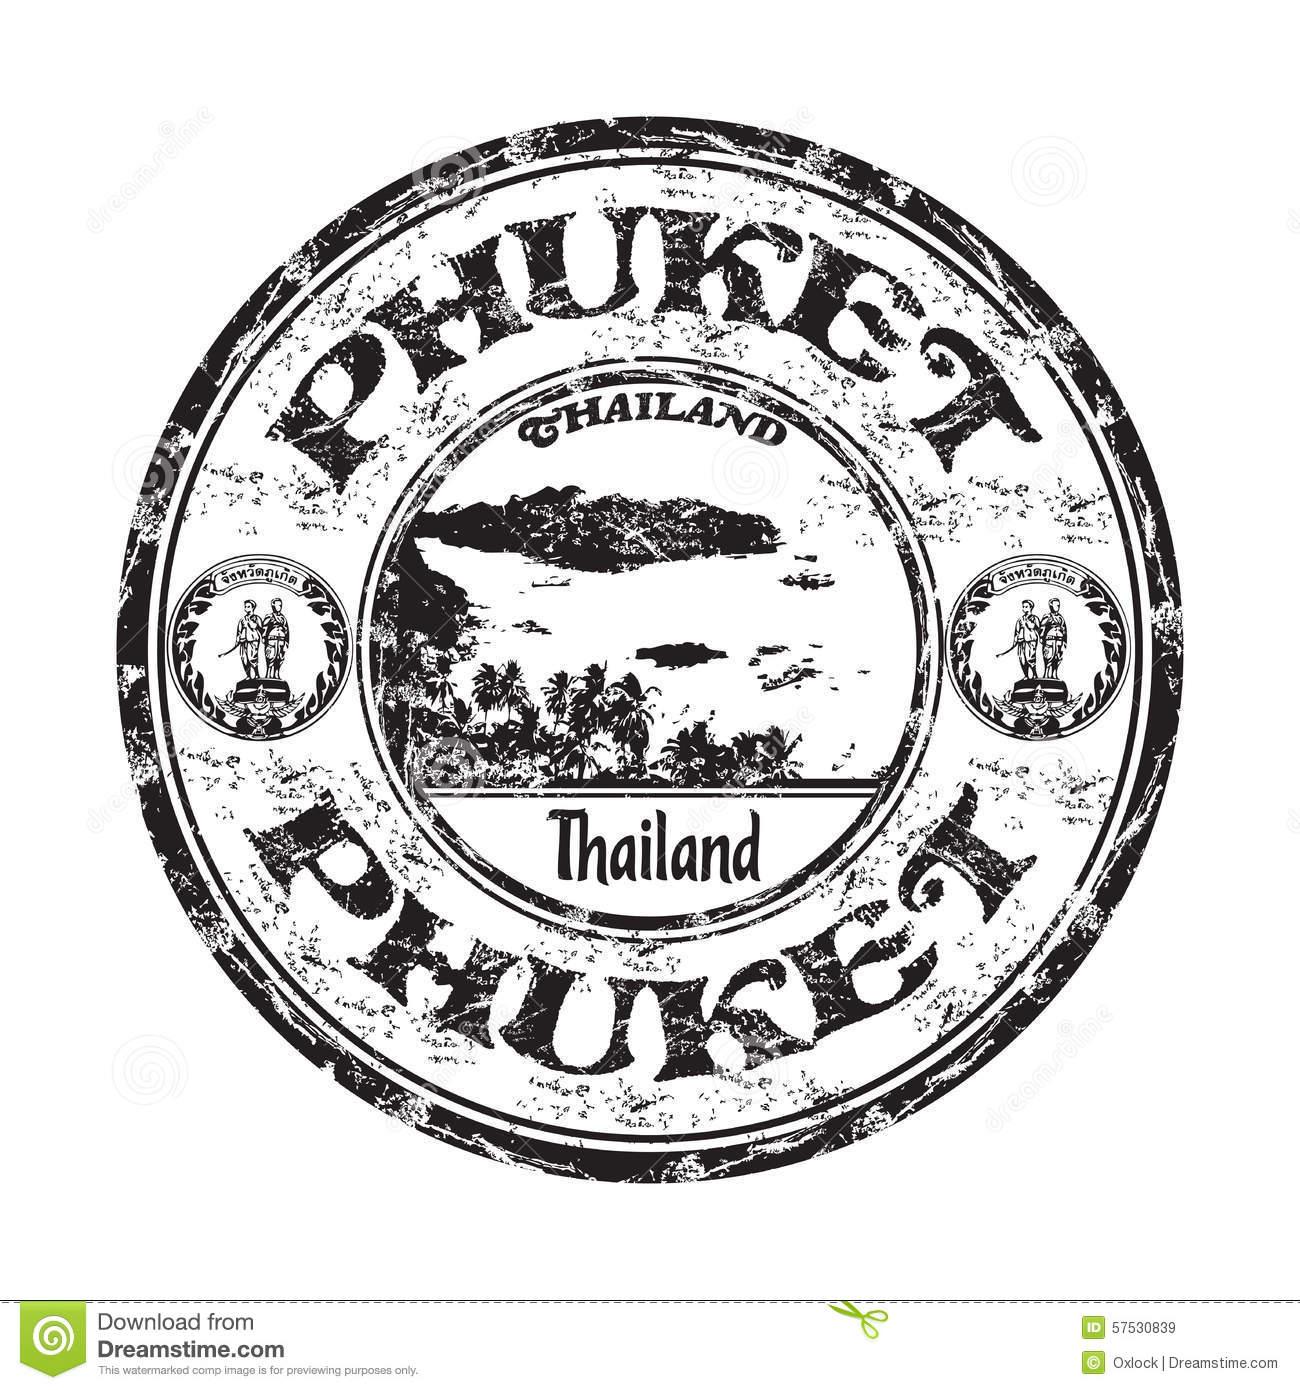 Phuket clipart #10, Download drawings